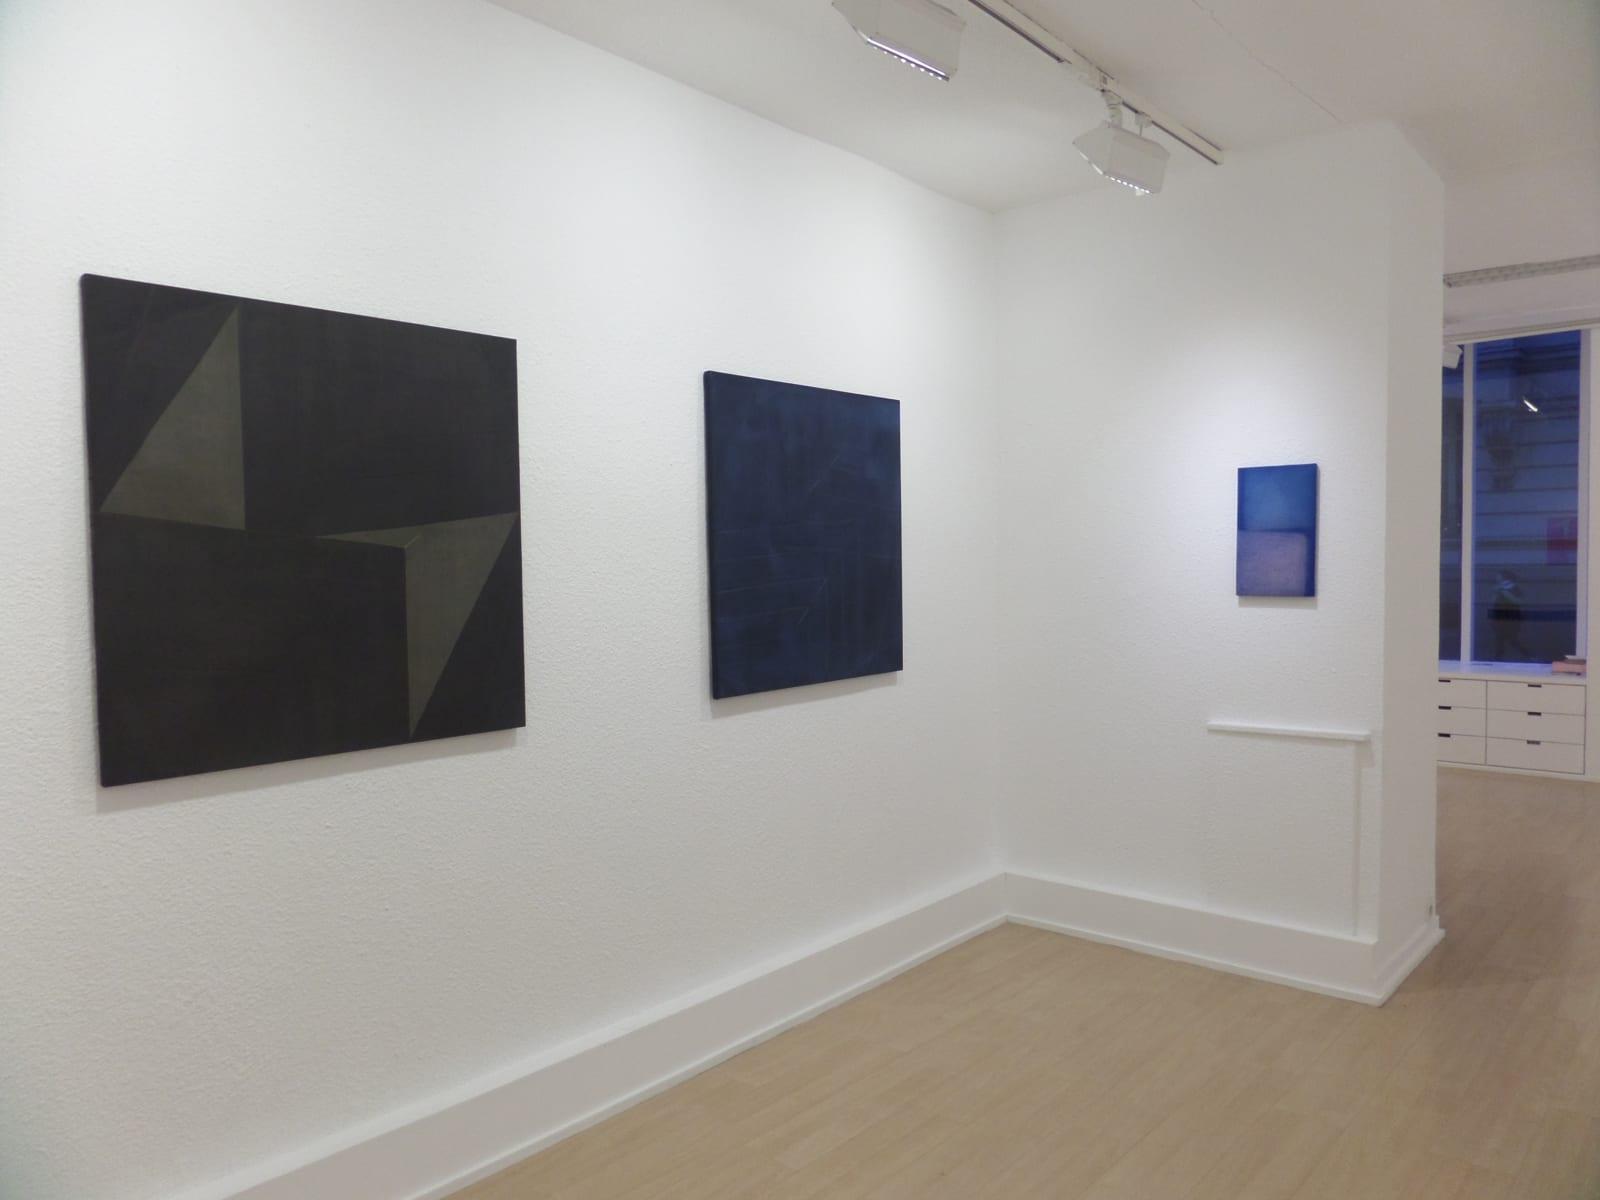 Guillaume Moschini / Strict & léger, exposition personnelle / Oniris 2018